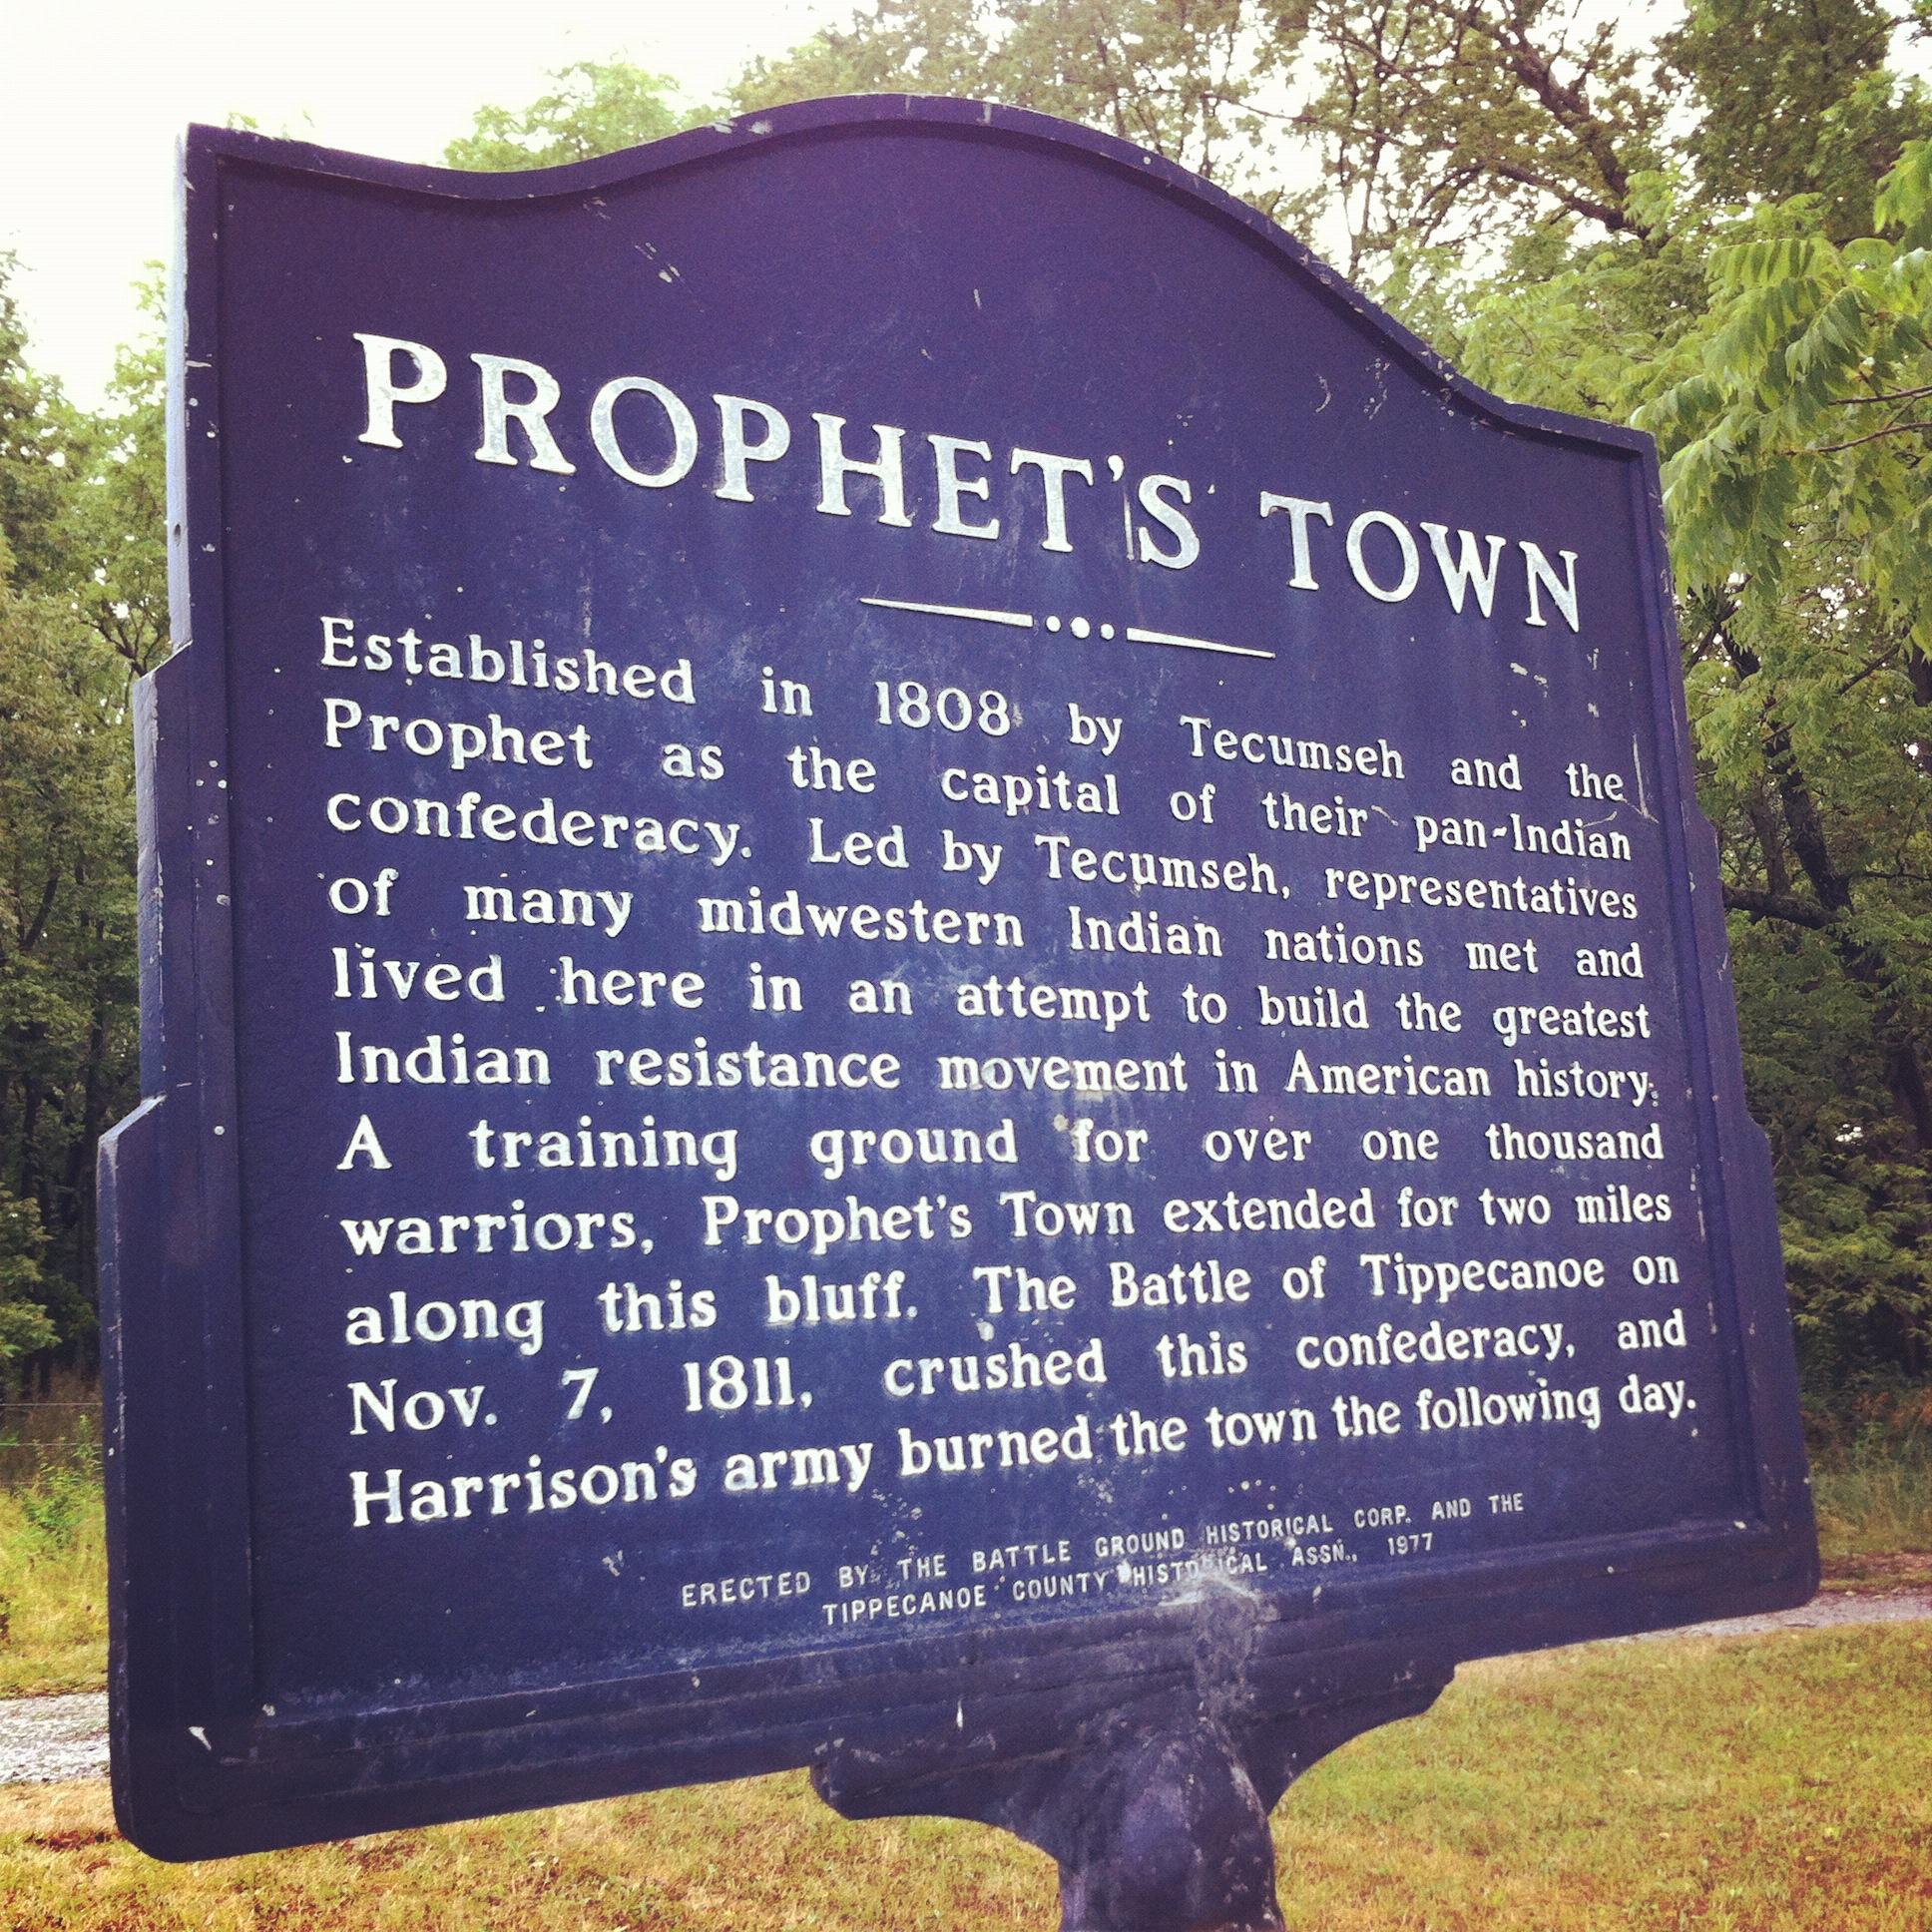 Historic marker of Prophetstown.